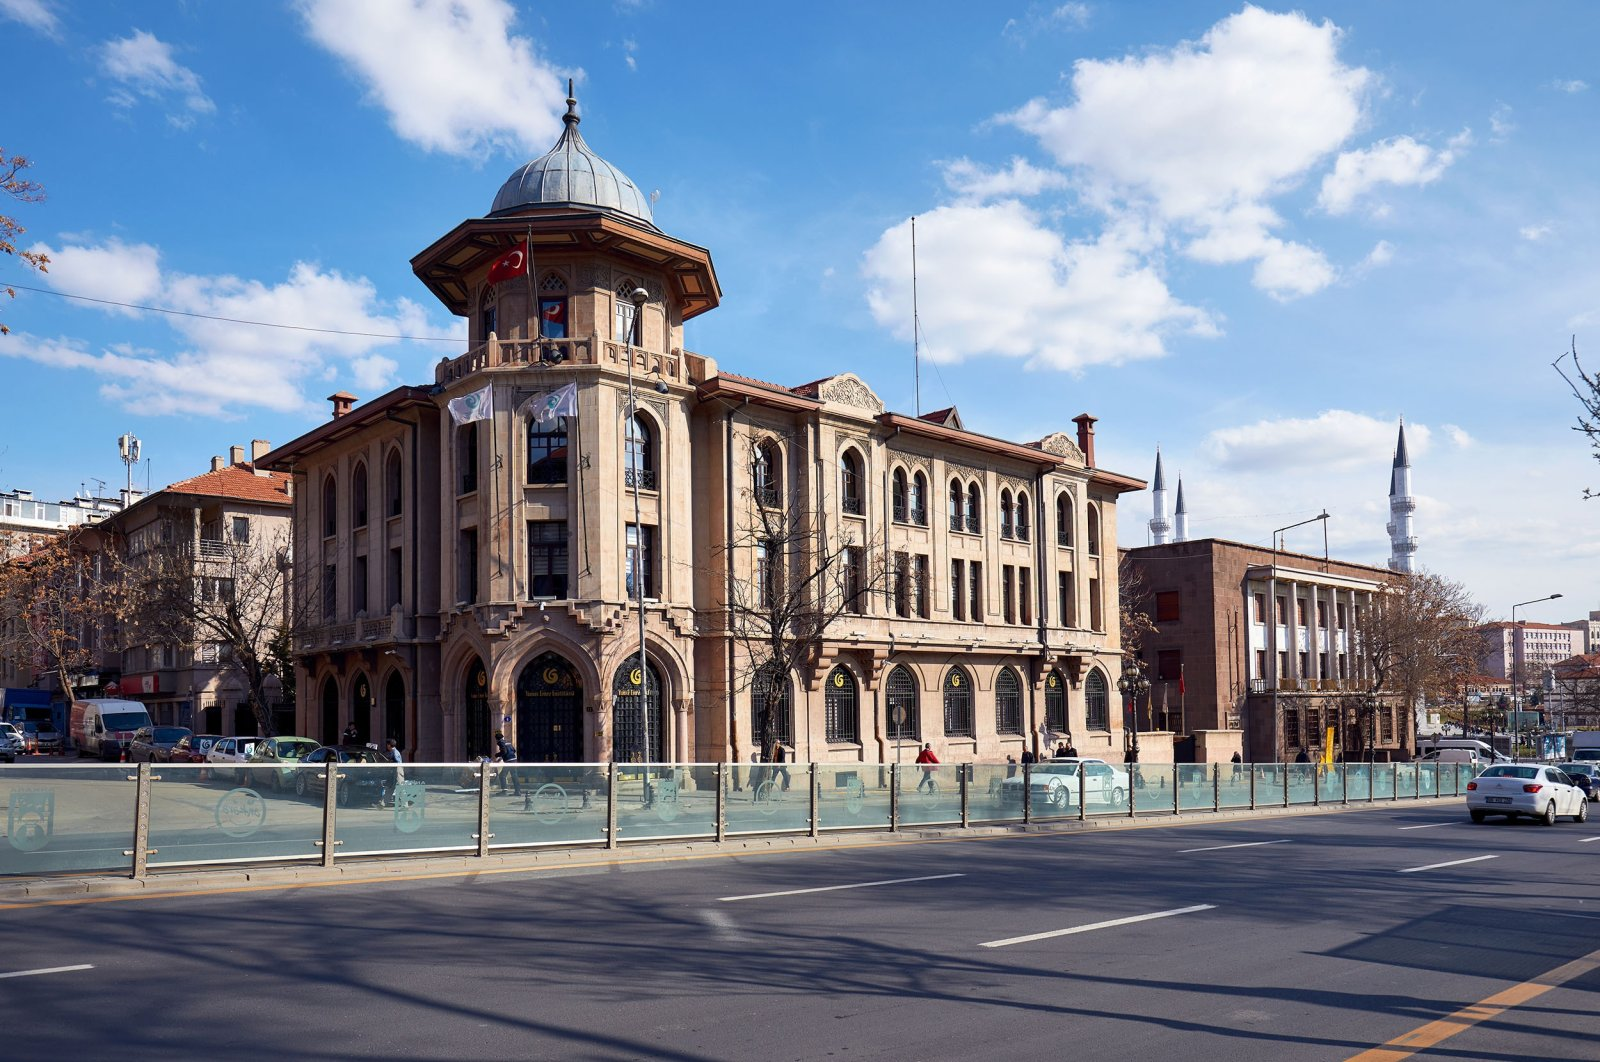 The Yunus Emre Institute building in the capital Ankara, Turkey, Mar. 1, 2020. (Shutterstock Photo)